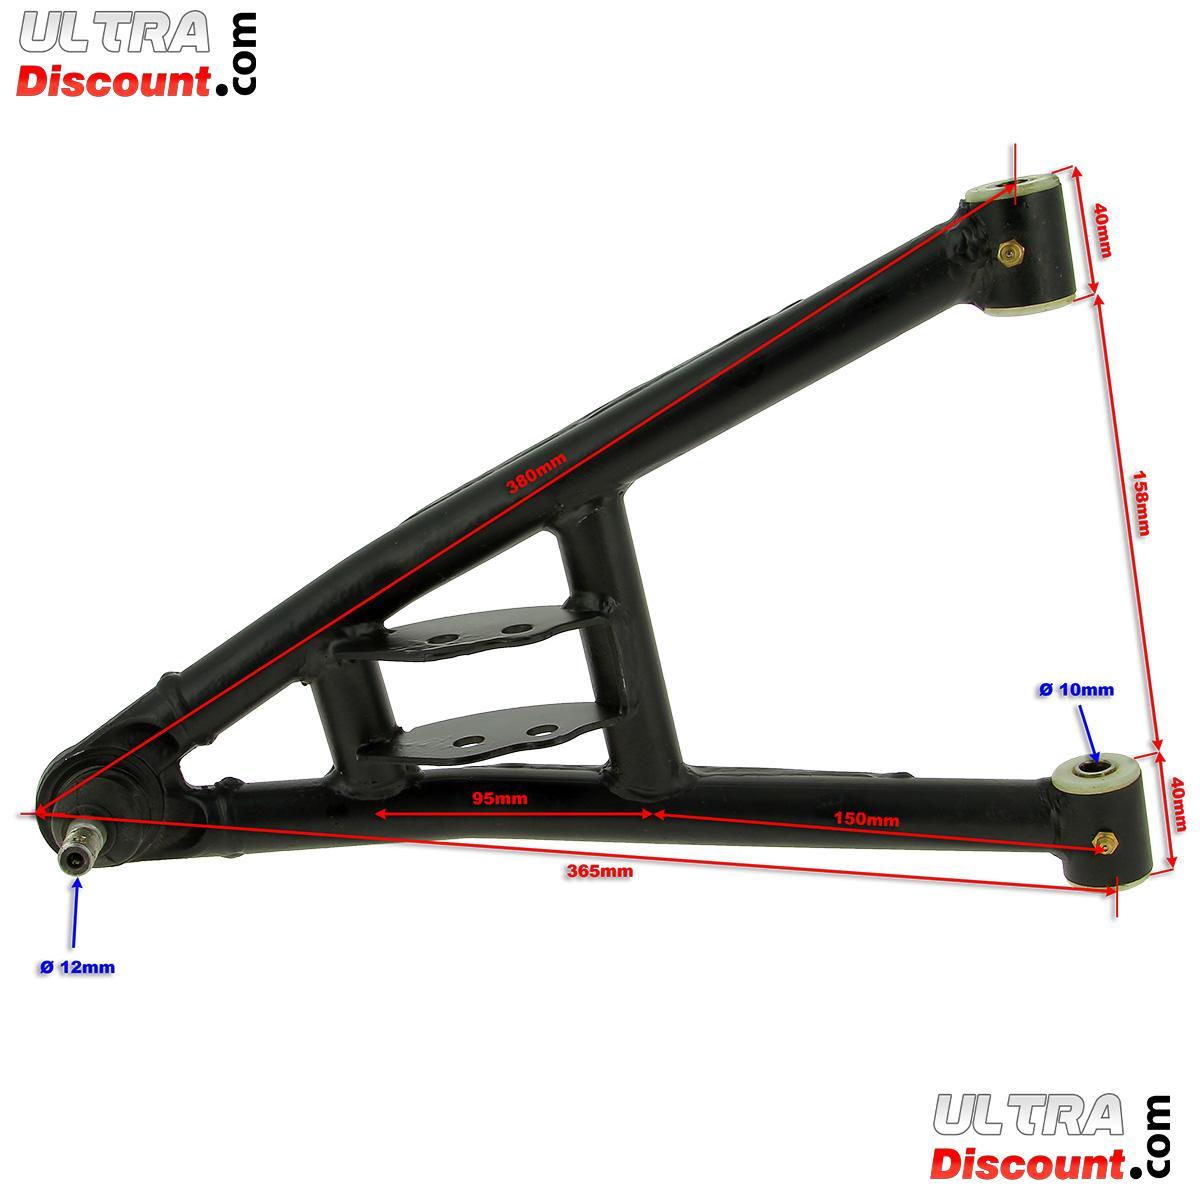 triangle de suspension inf rieur gauche pour quads shineray 200st 9 pi ces shineray 200 st9. Black Bedroom Furniture Sets. Home Design Ideas